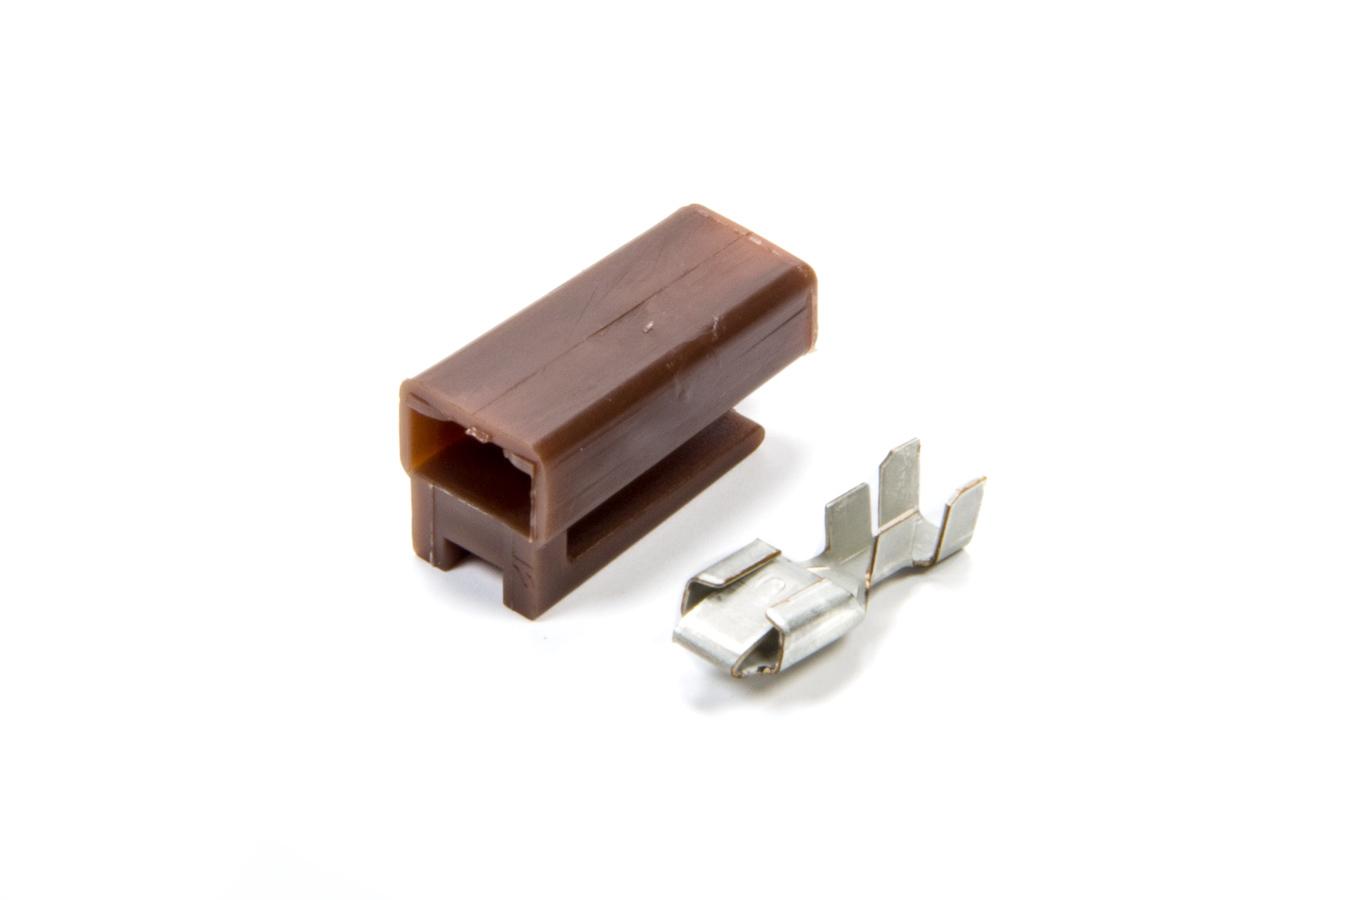 Performance Distributors 111111 Wiring Terminal, Ignition / Tachometer, Plastic, HEI Style Distributors, Each